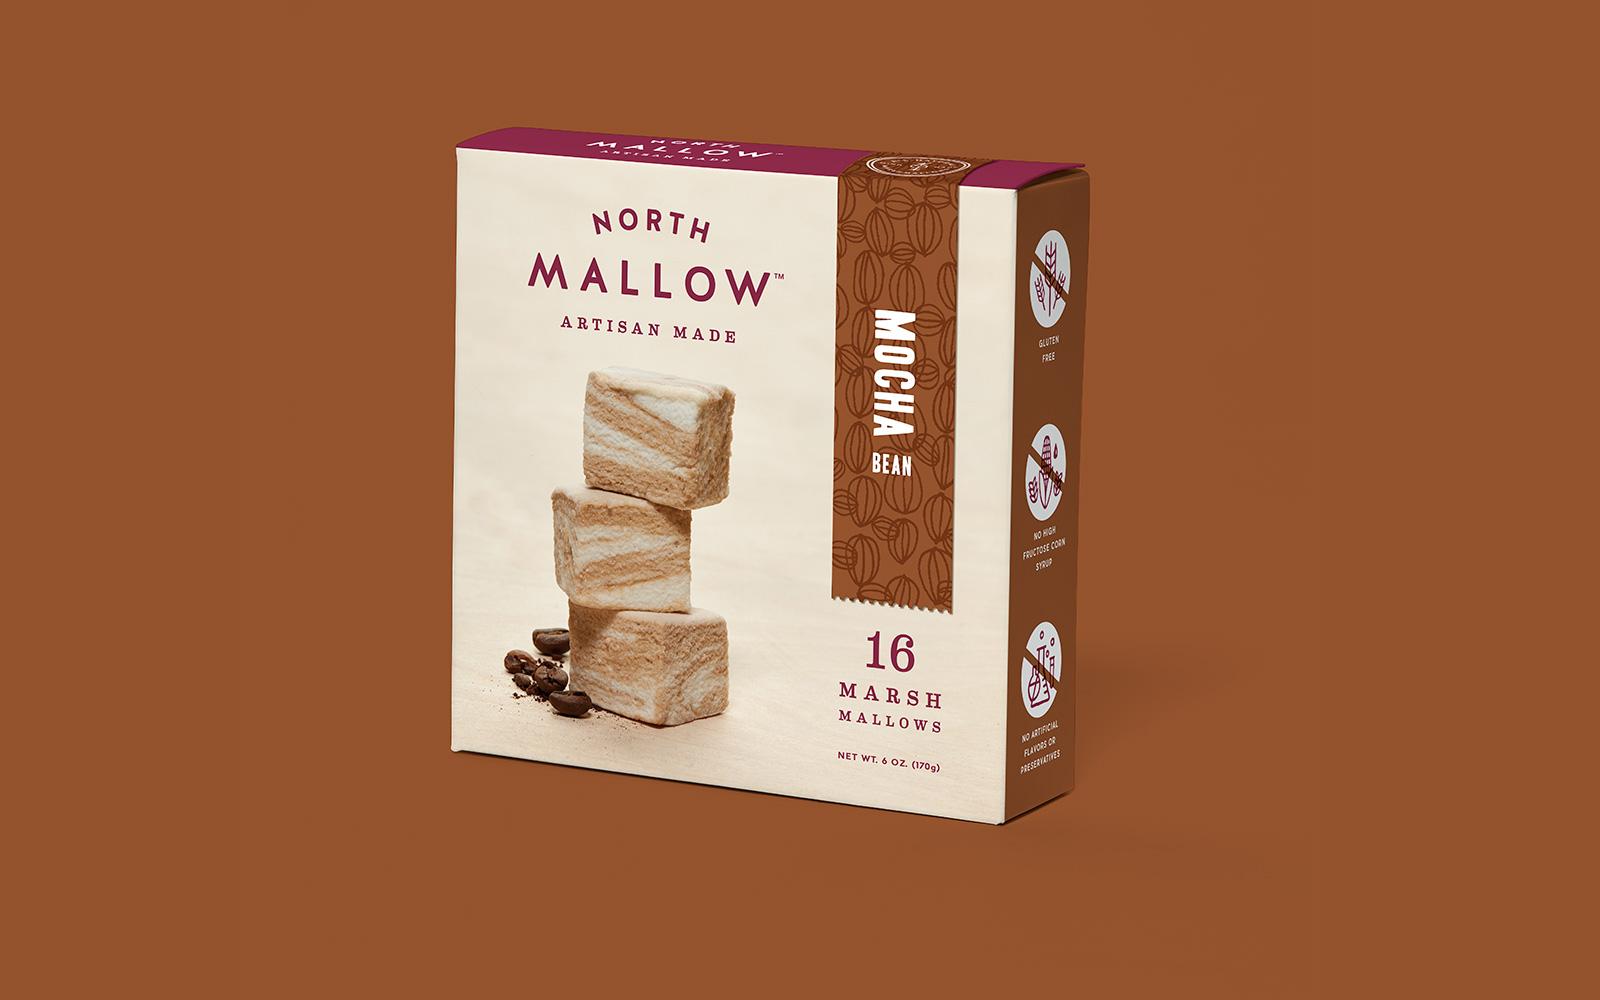 Wink - North Mallow9.jpg